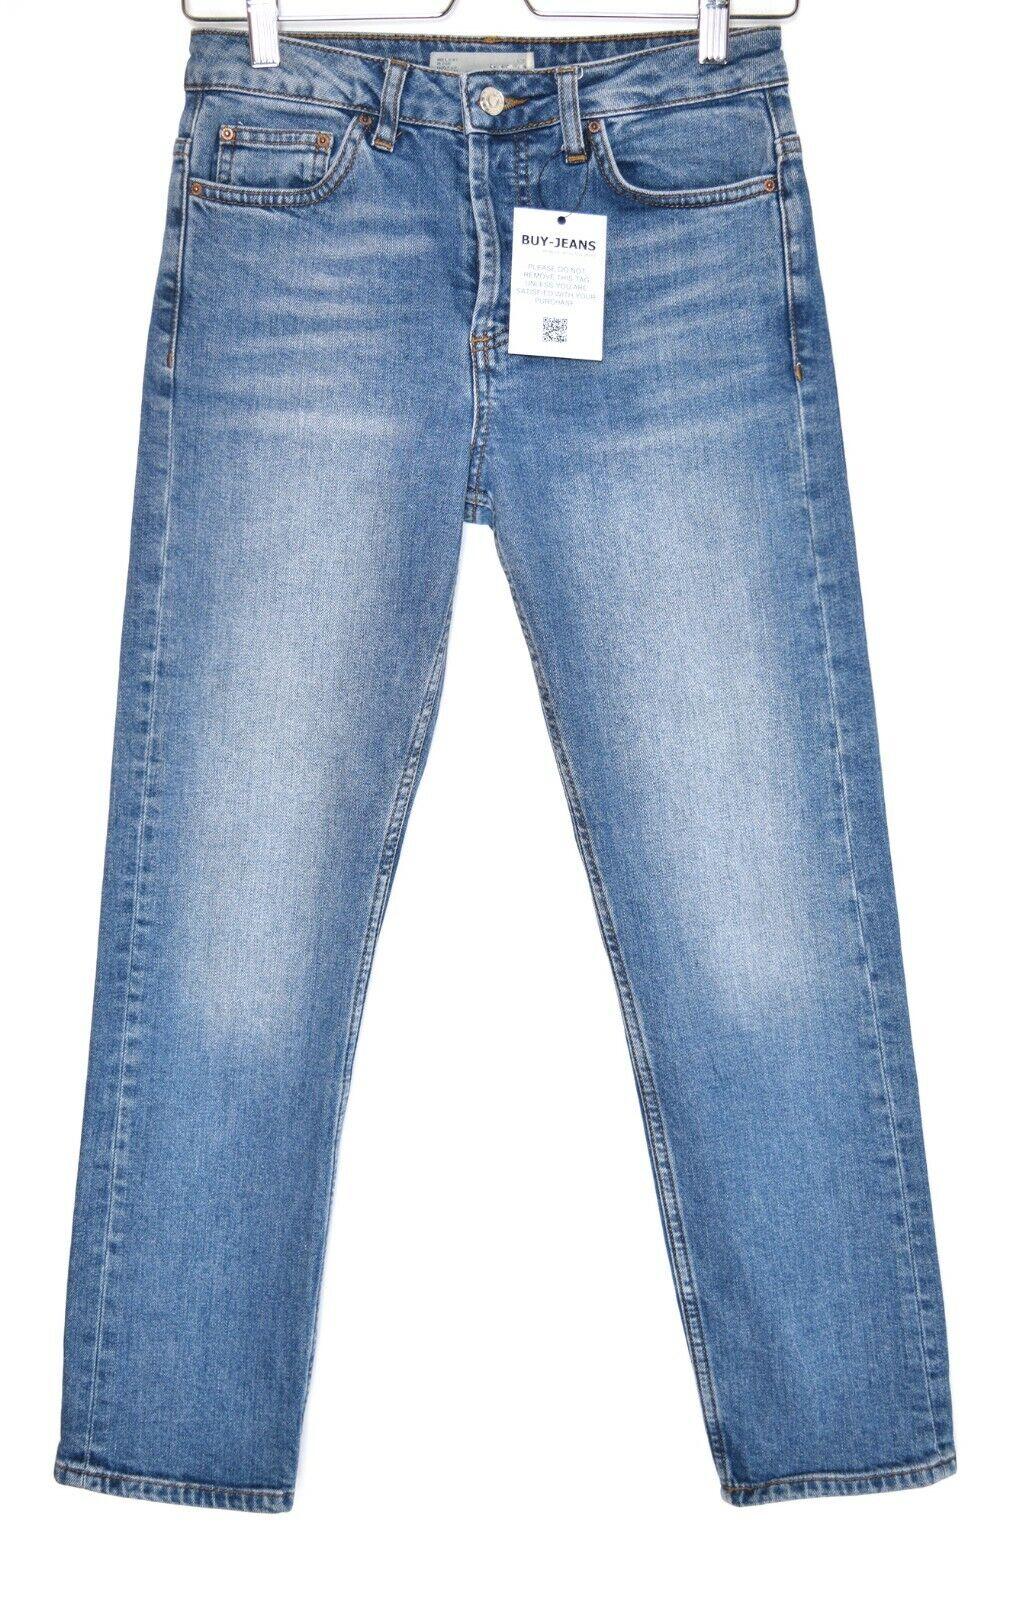 Topshop GIRLFRIEND High Rise Slim Leg Stonewashed bluee Jeans Size 8 W26 L30